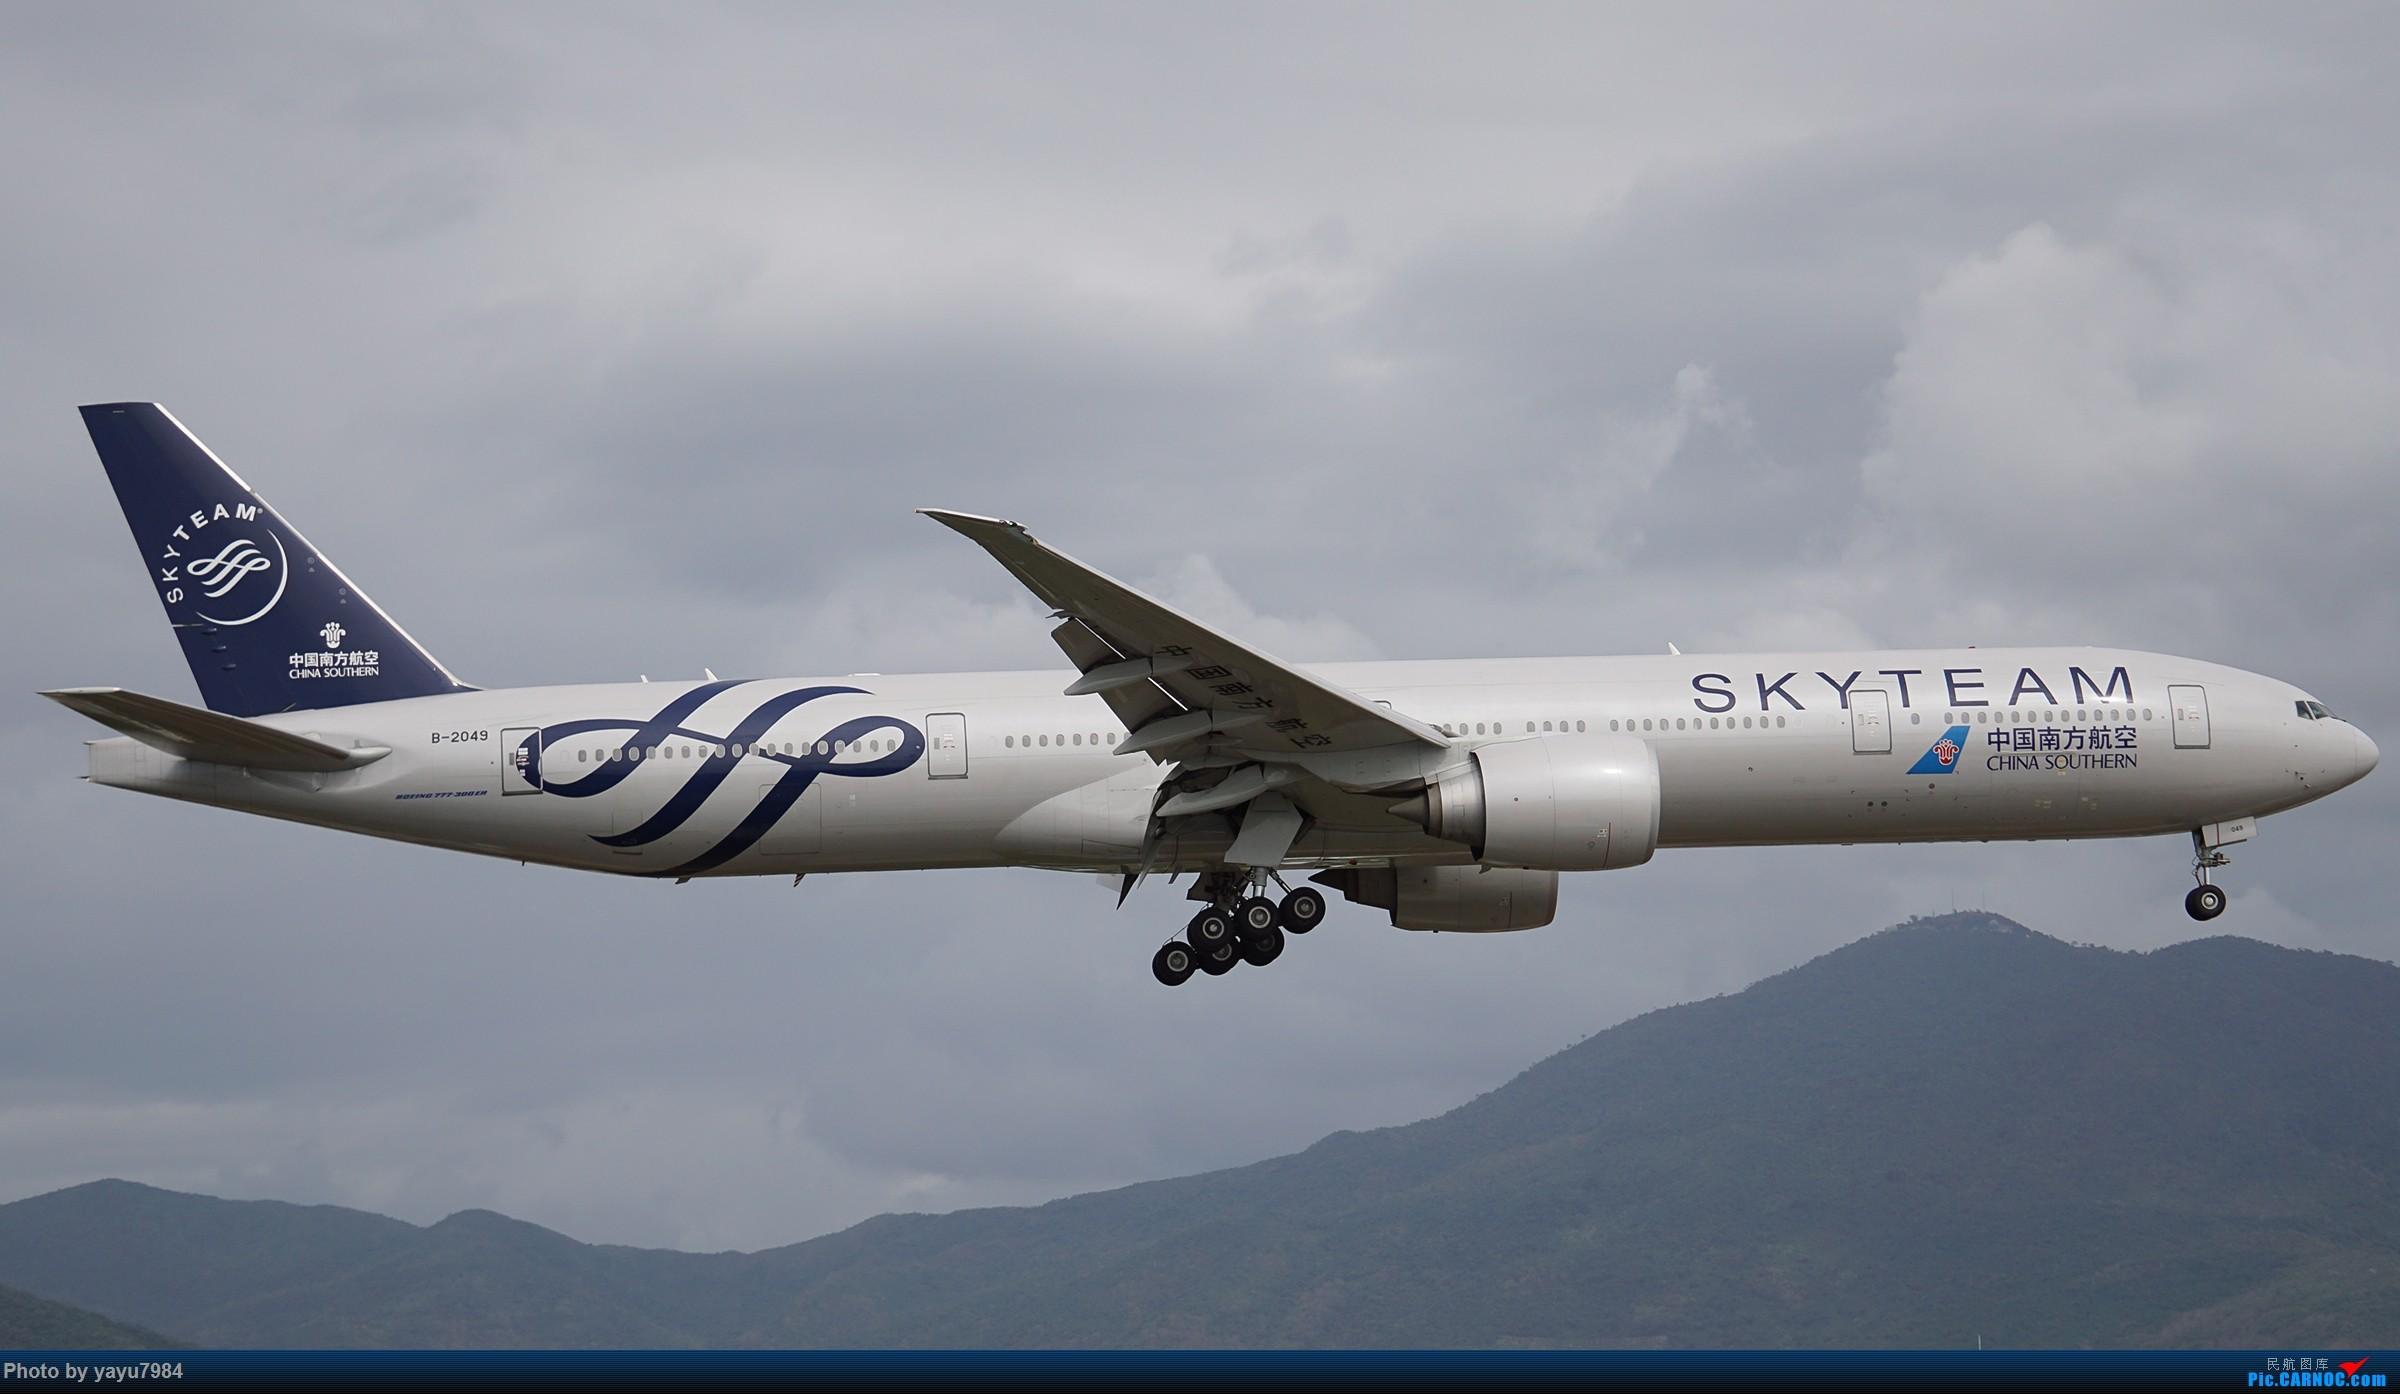 Re:[原创][SYX] 回国首拍,春运高峰时段的三亚凤凰国际机场 BOEING 777-300ER B-2049 中国三亚凤凰国际机场